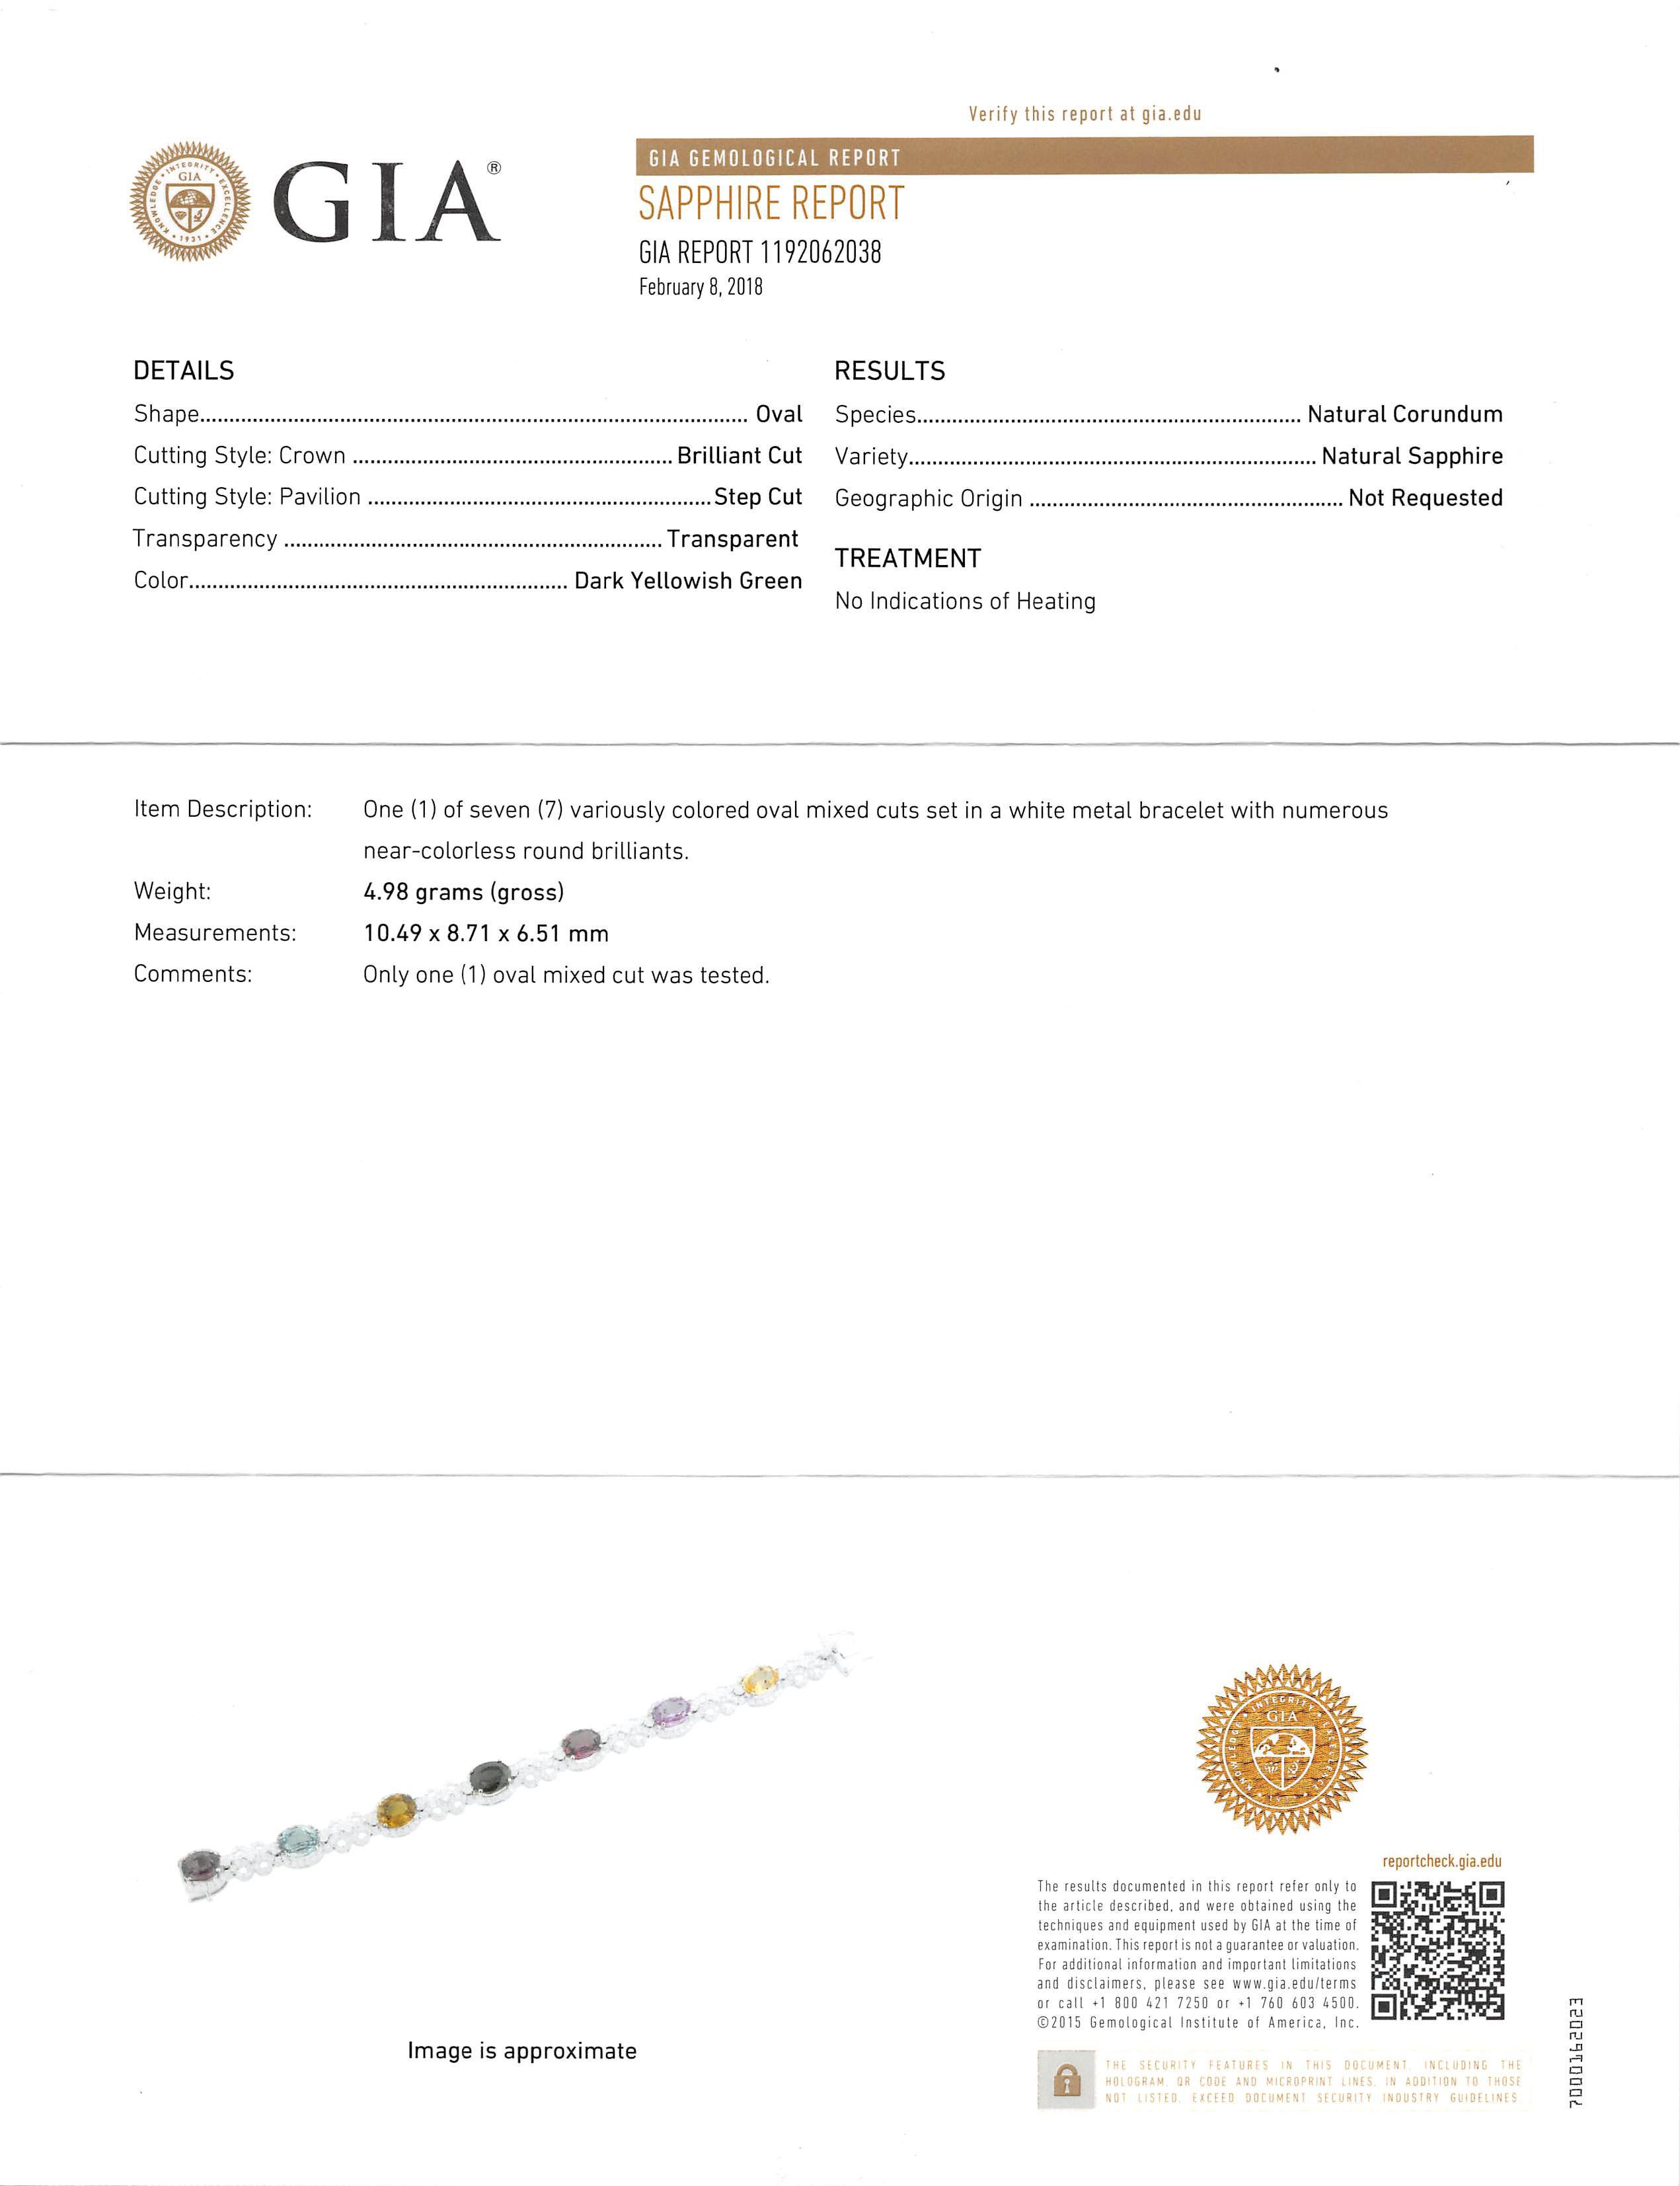 Lot 615 - Rare 14 kt. White Gold, Sapphire and Diamond Bracelet , seven prong set oval mixed cut multicolor